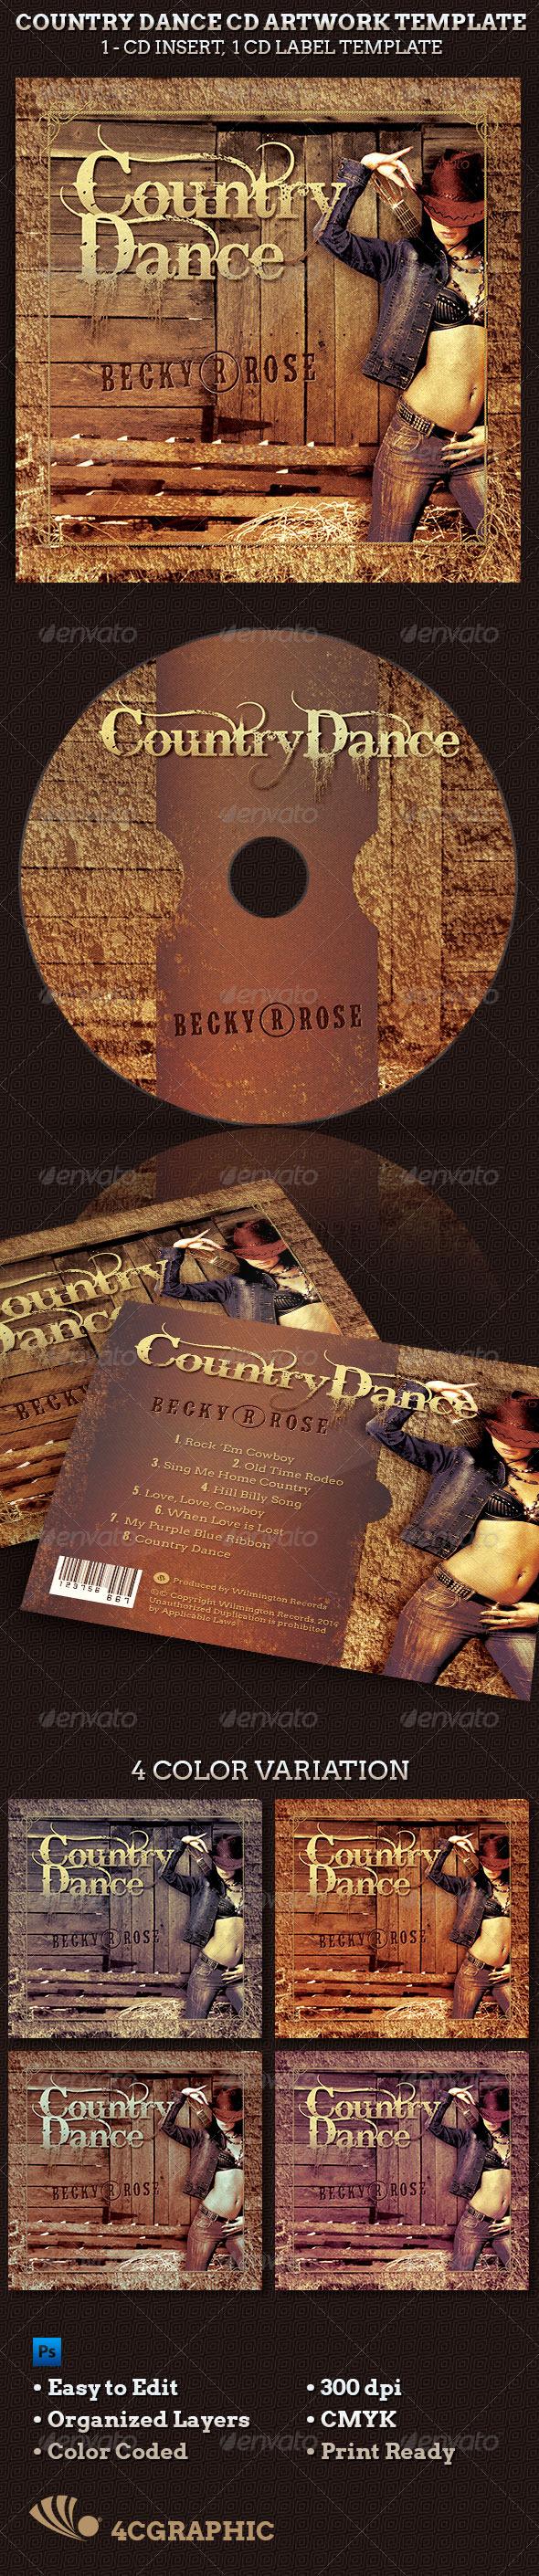 Country Dance Music CD Artwork Template  - CD & DVD Artwork Print Templates